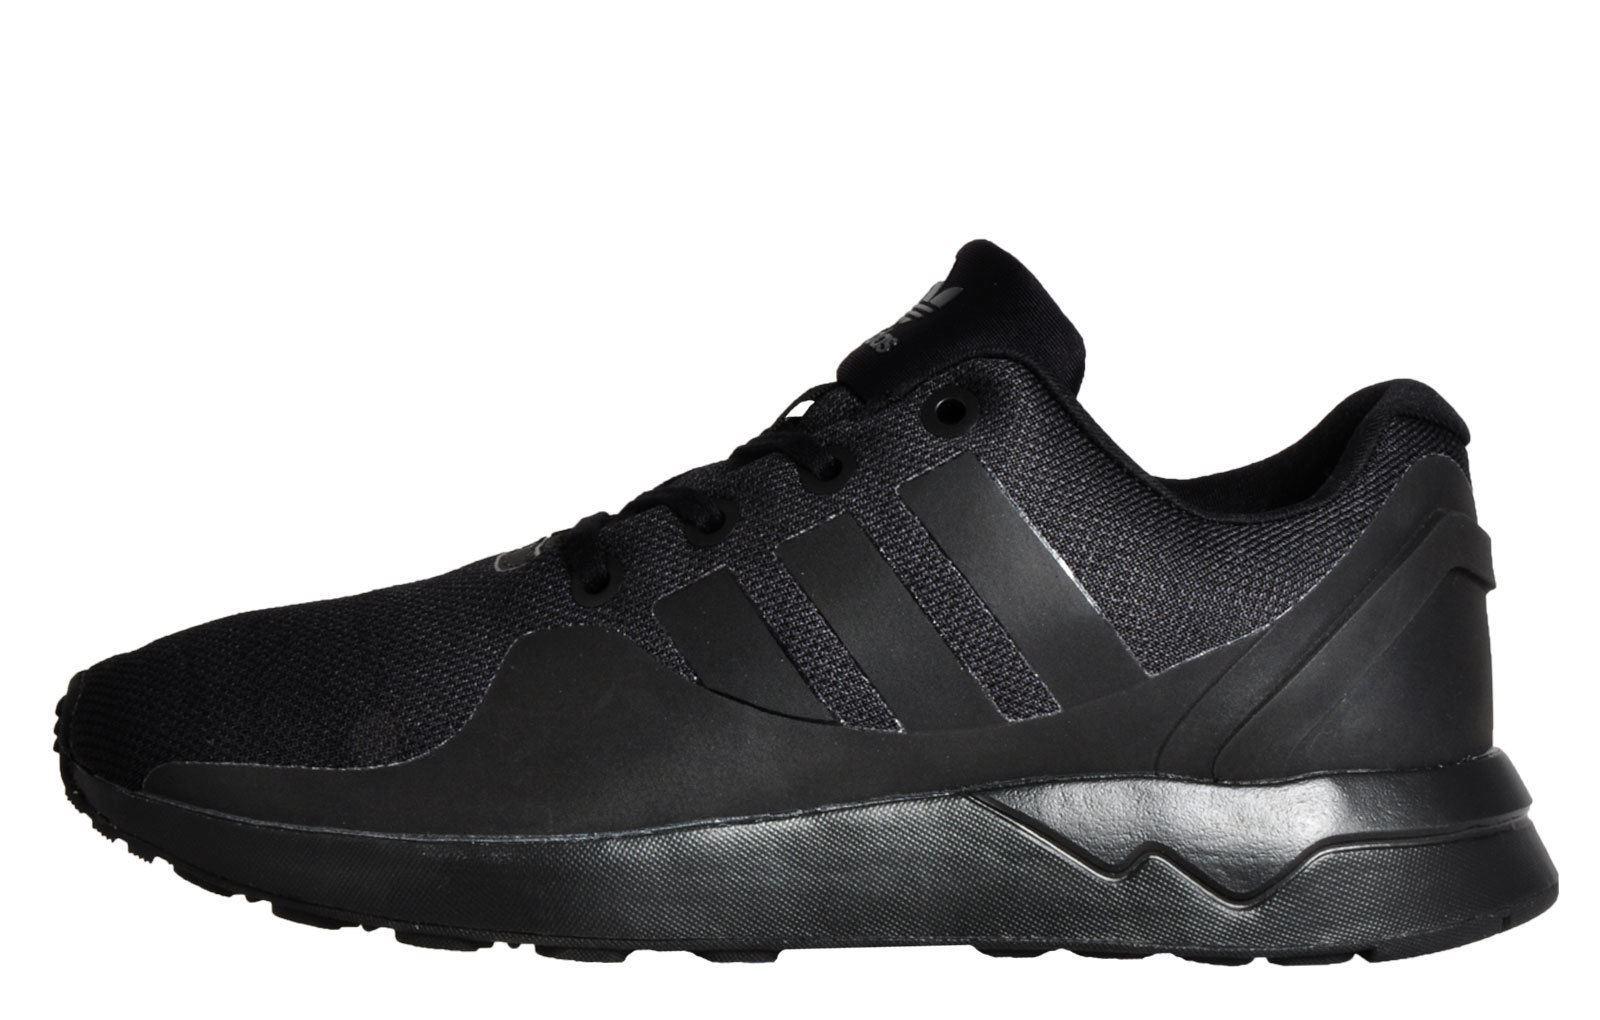 d30f121f8 ... adidas Originals ZX Flux ADV Tech Trainers Mens Black Sneakers Shoes  Footwear ...